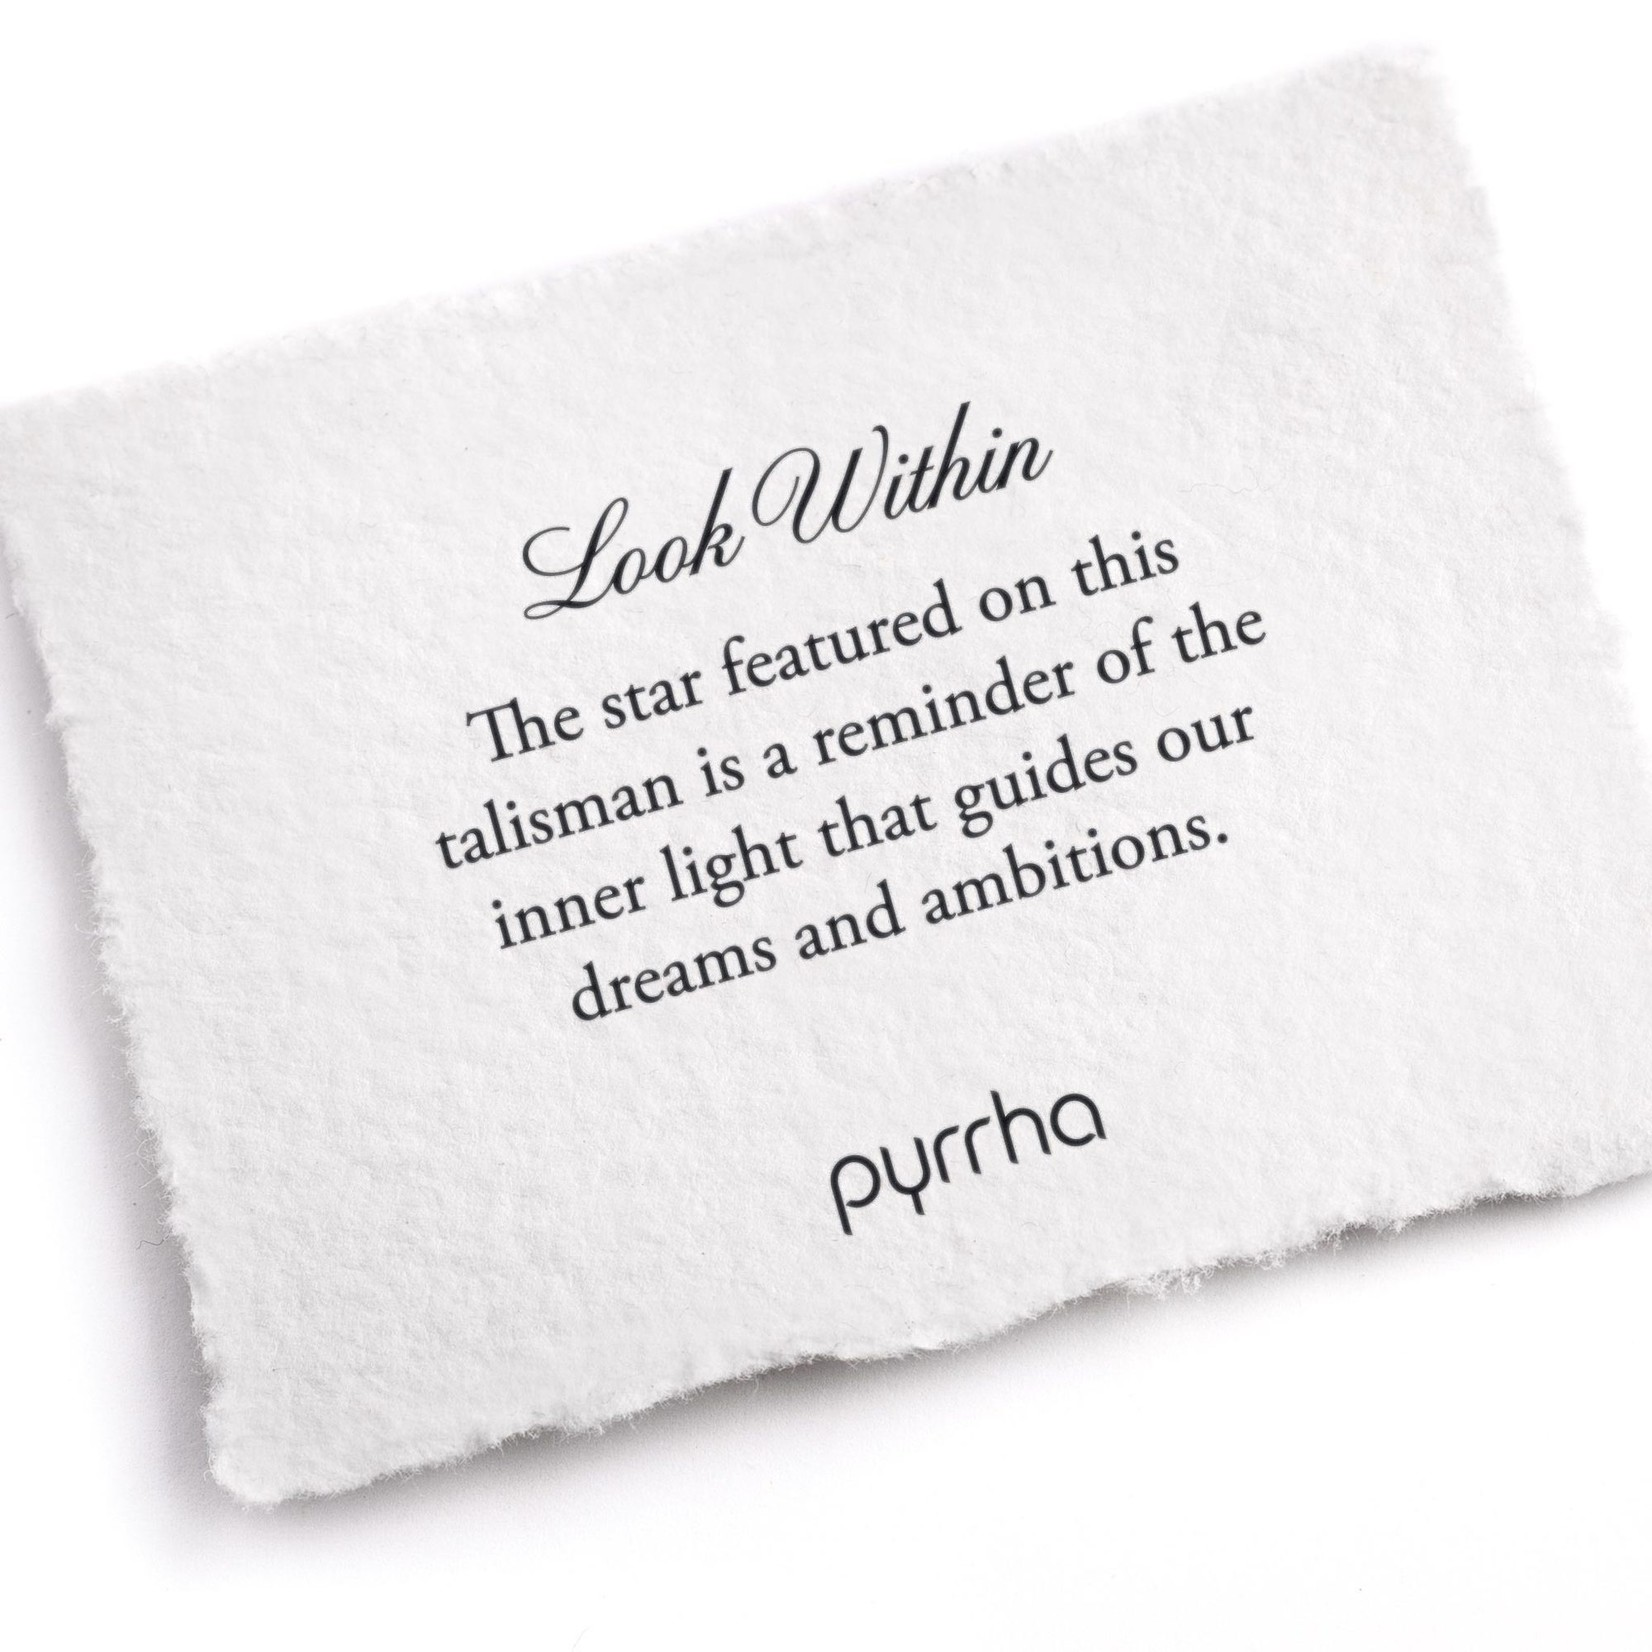 Pyrrha Look Within 14K Gold Talisman